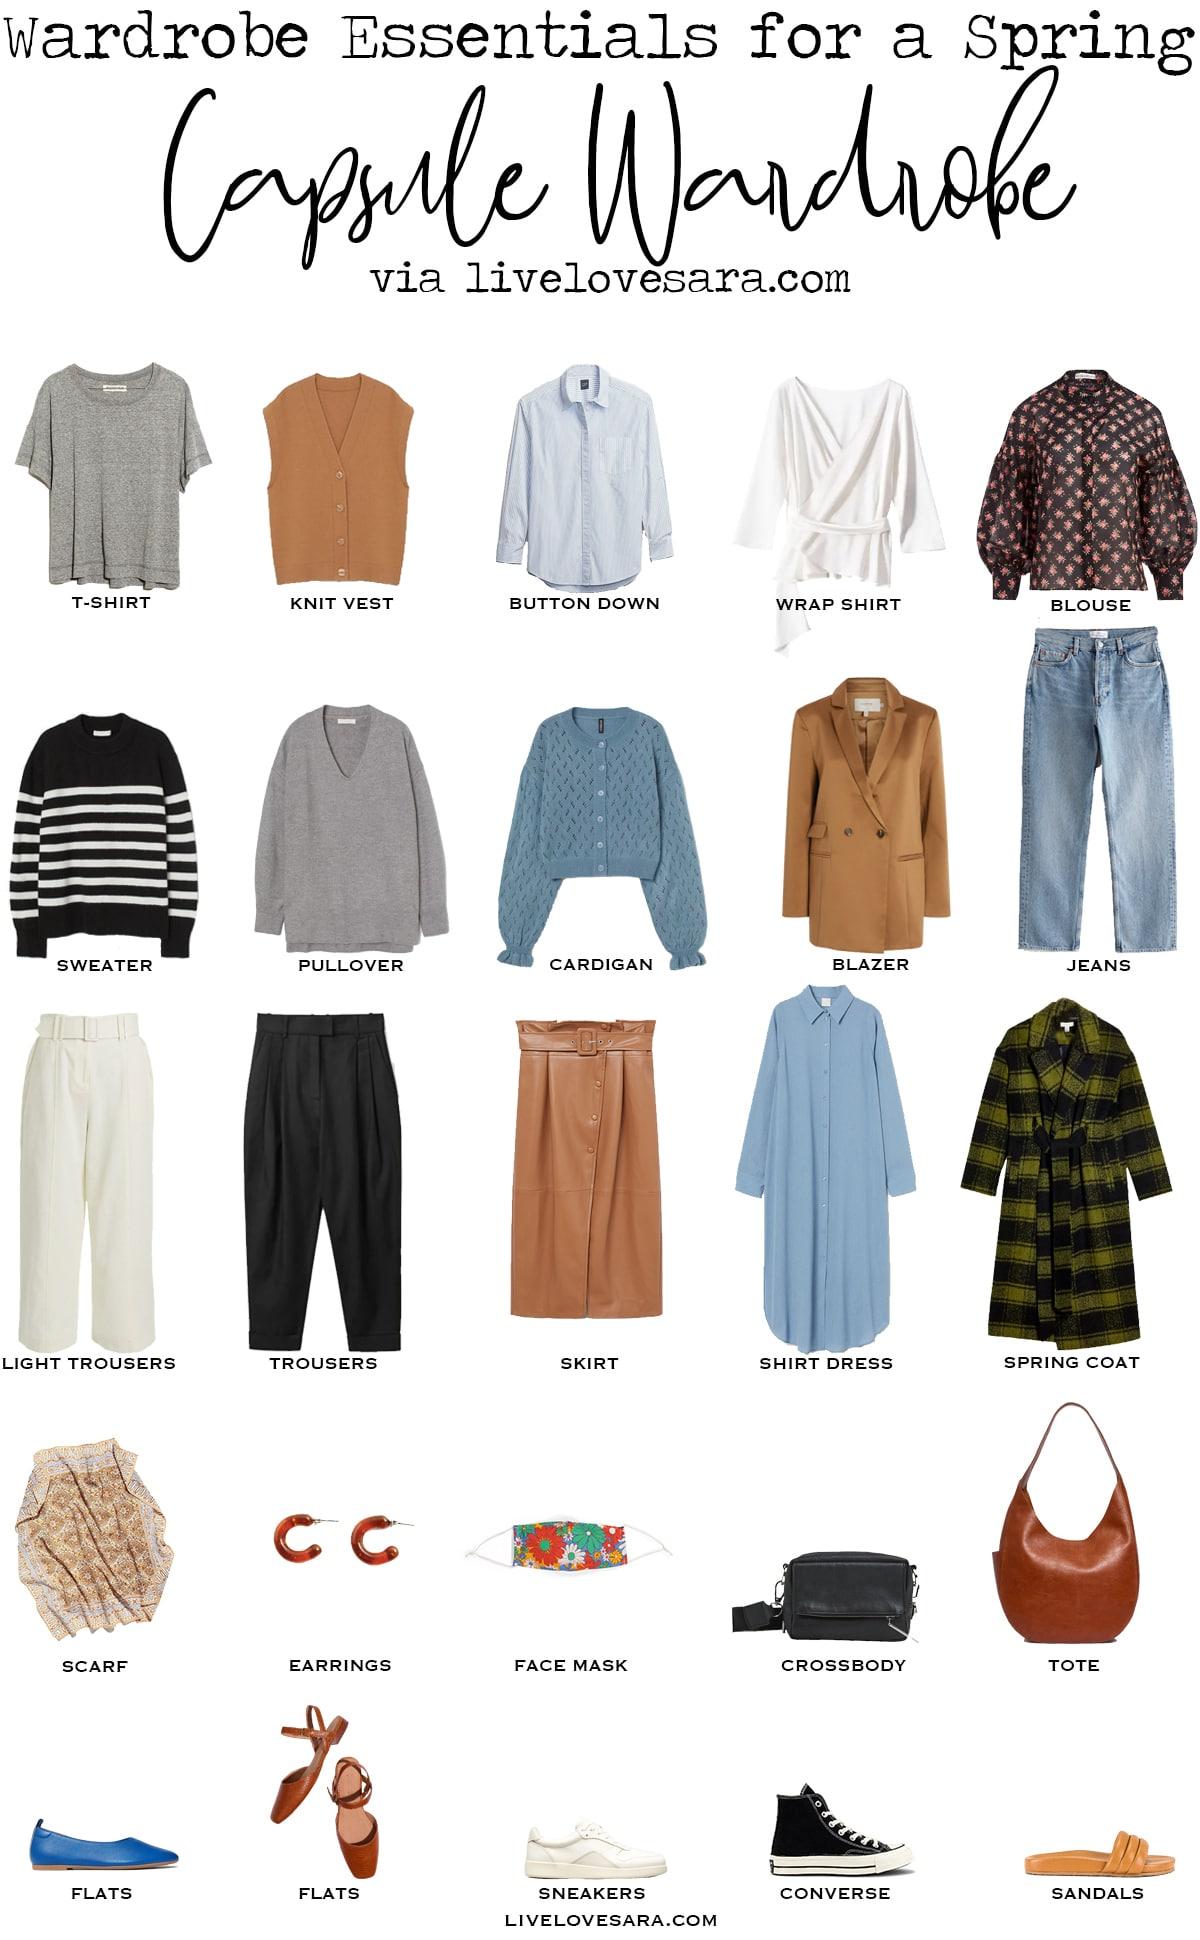 Spring Capsule Wardrobe Essentials - livelovesara